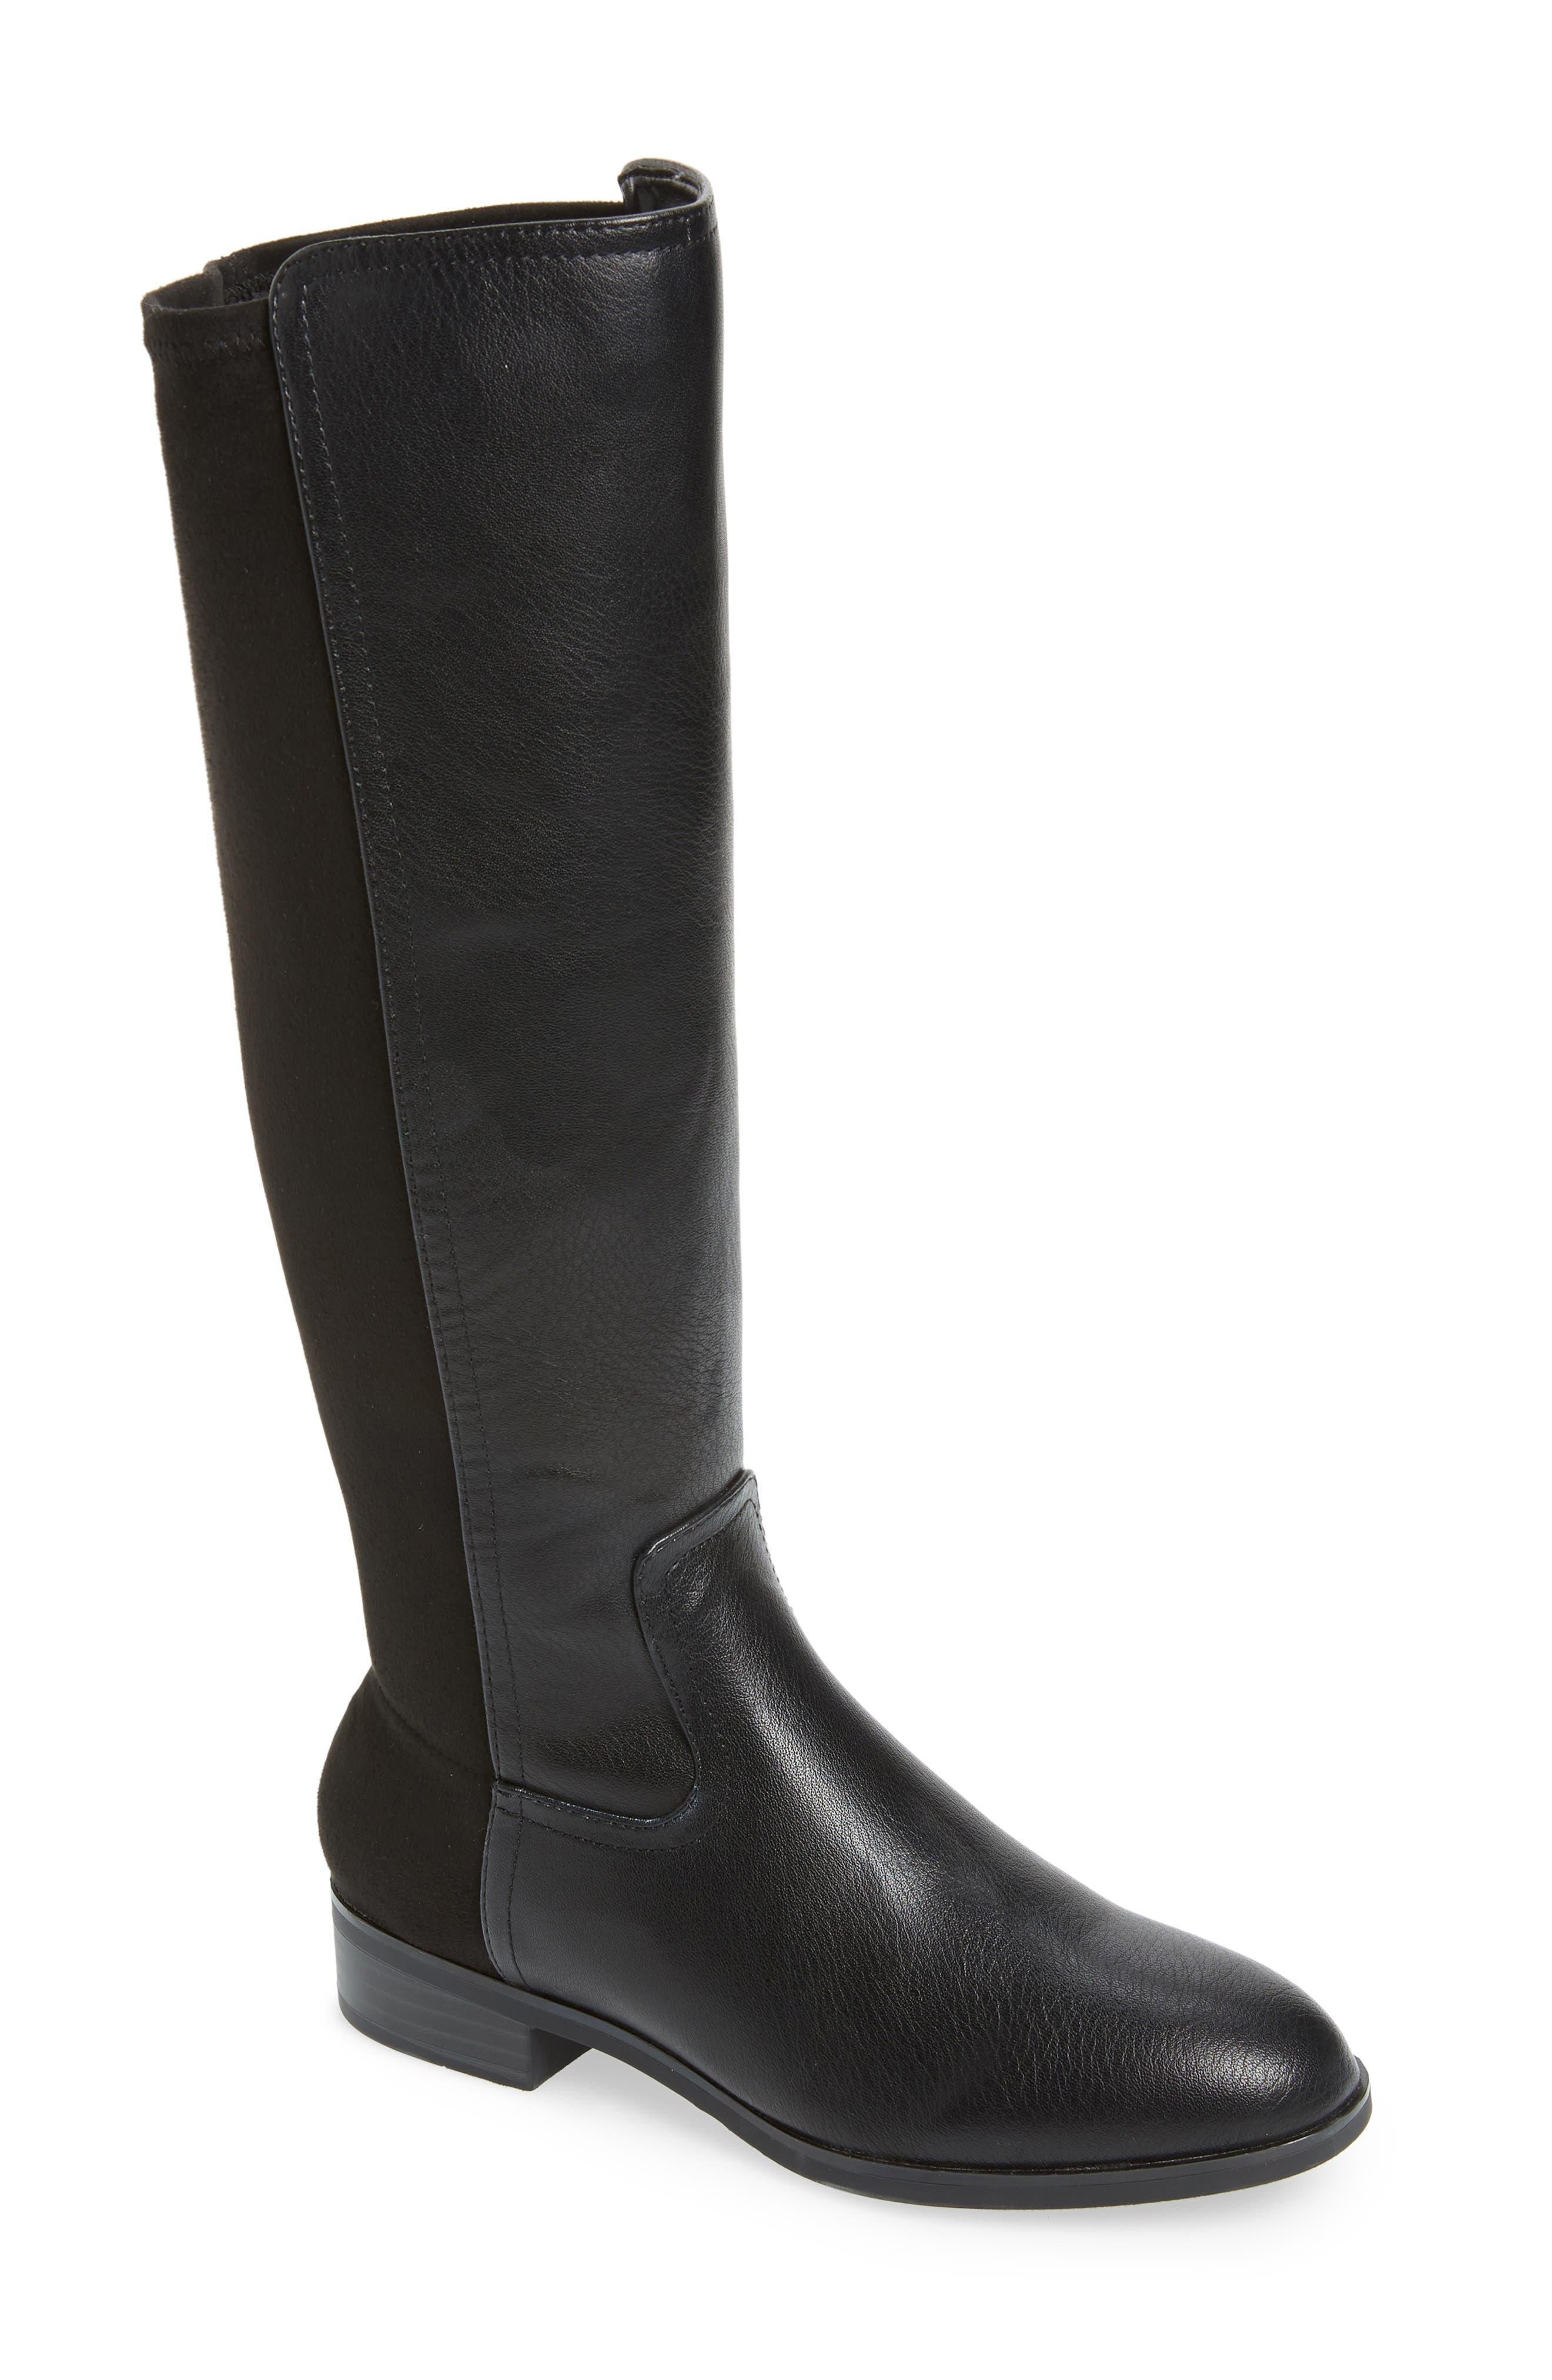 Kensie Carin Stretch Back Knee High Boot- Black